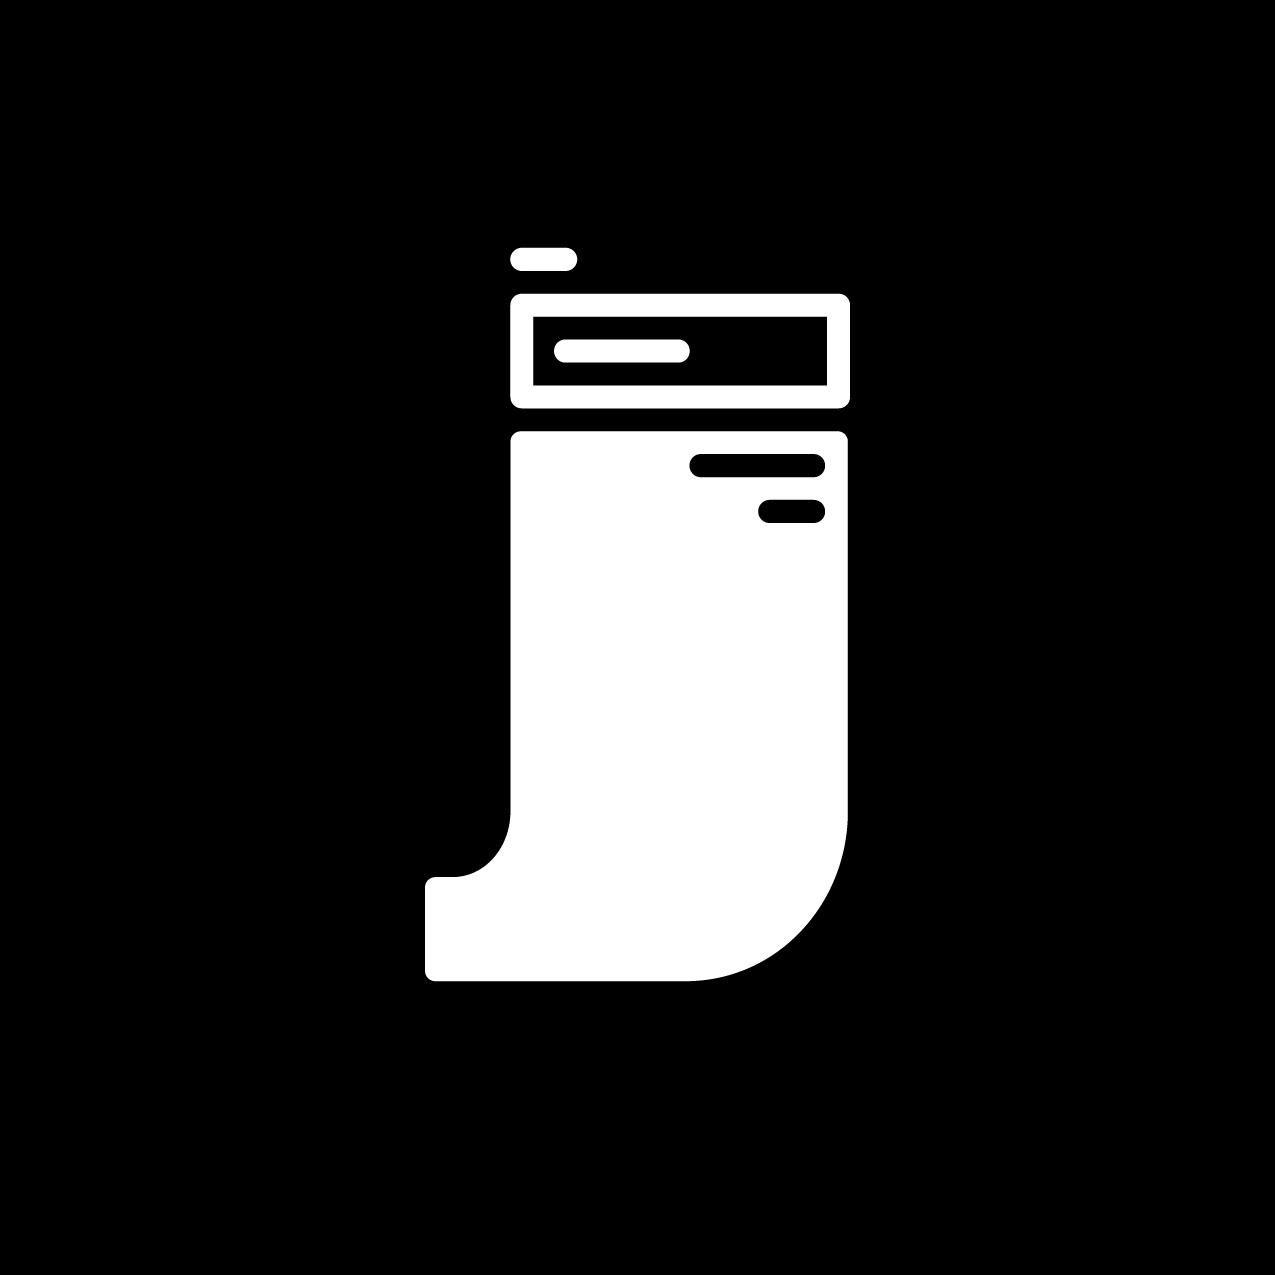 Letter J13 Design by Furia